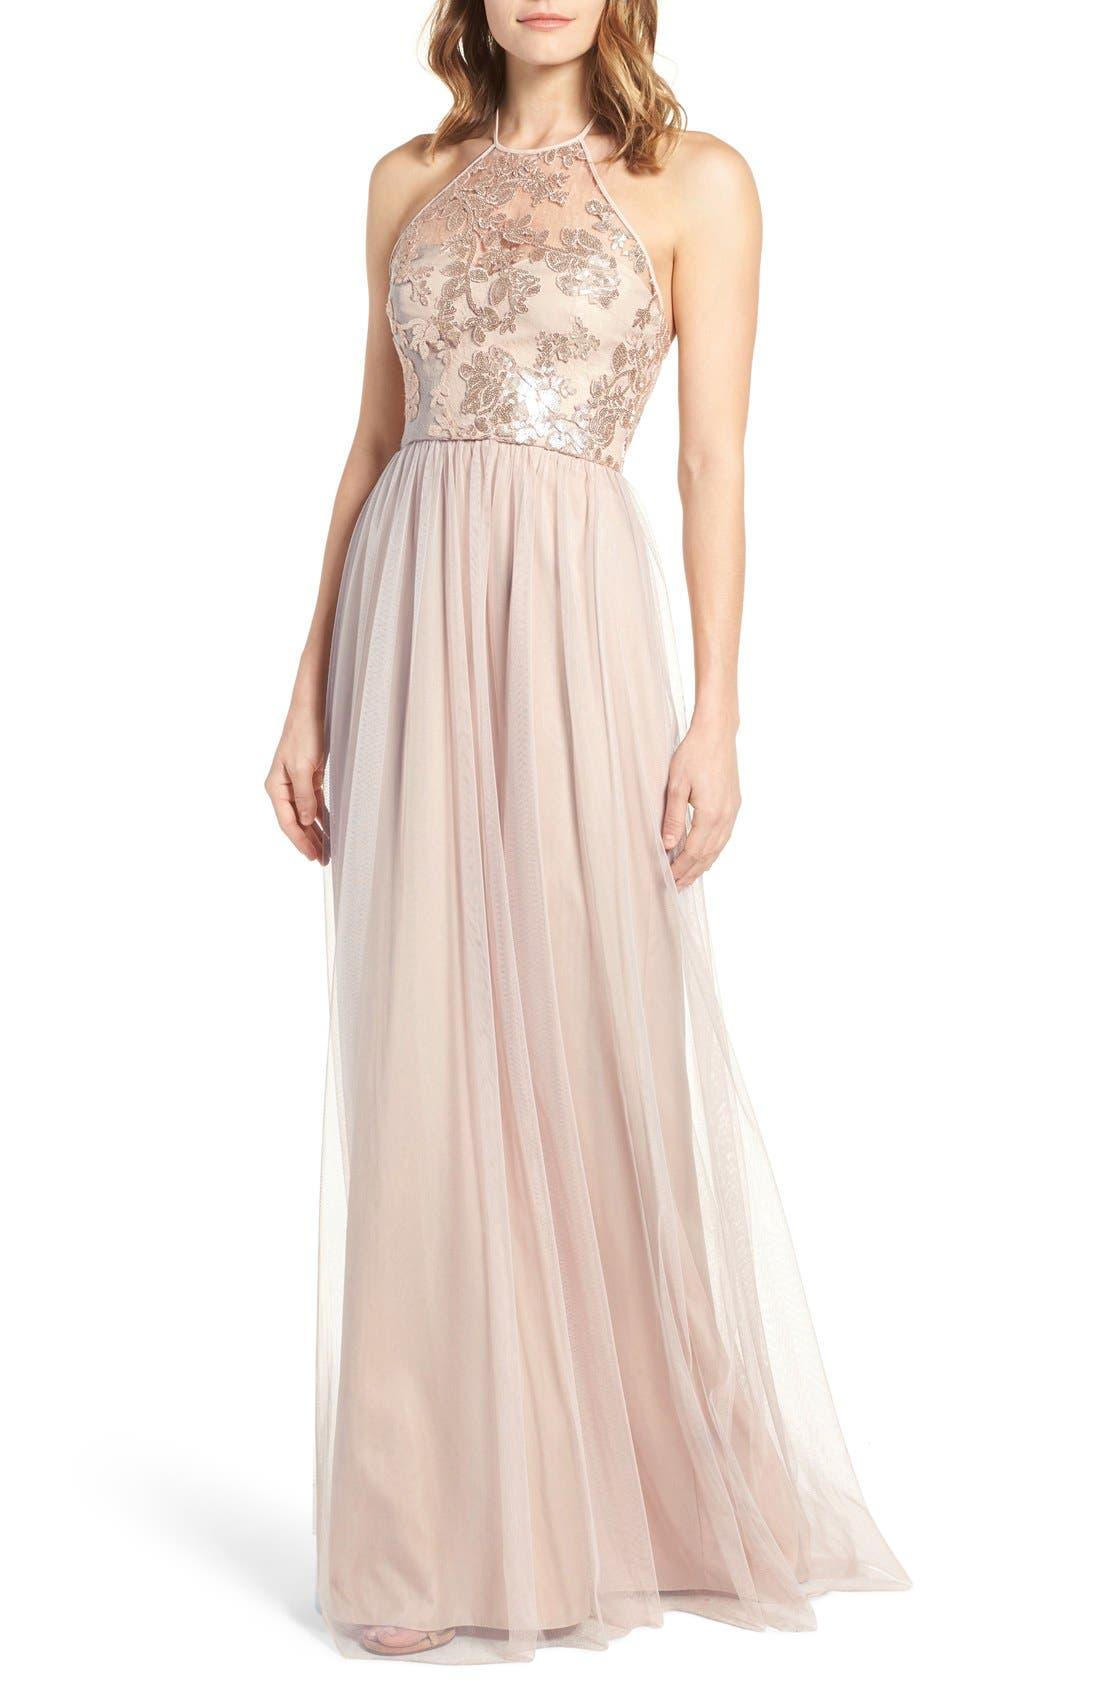 AMSALE Sheridan Sequin Halter Dress in Fawn